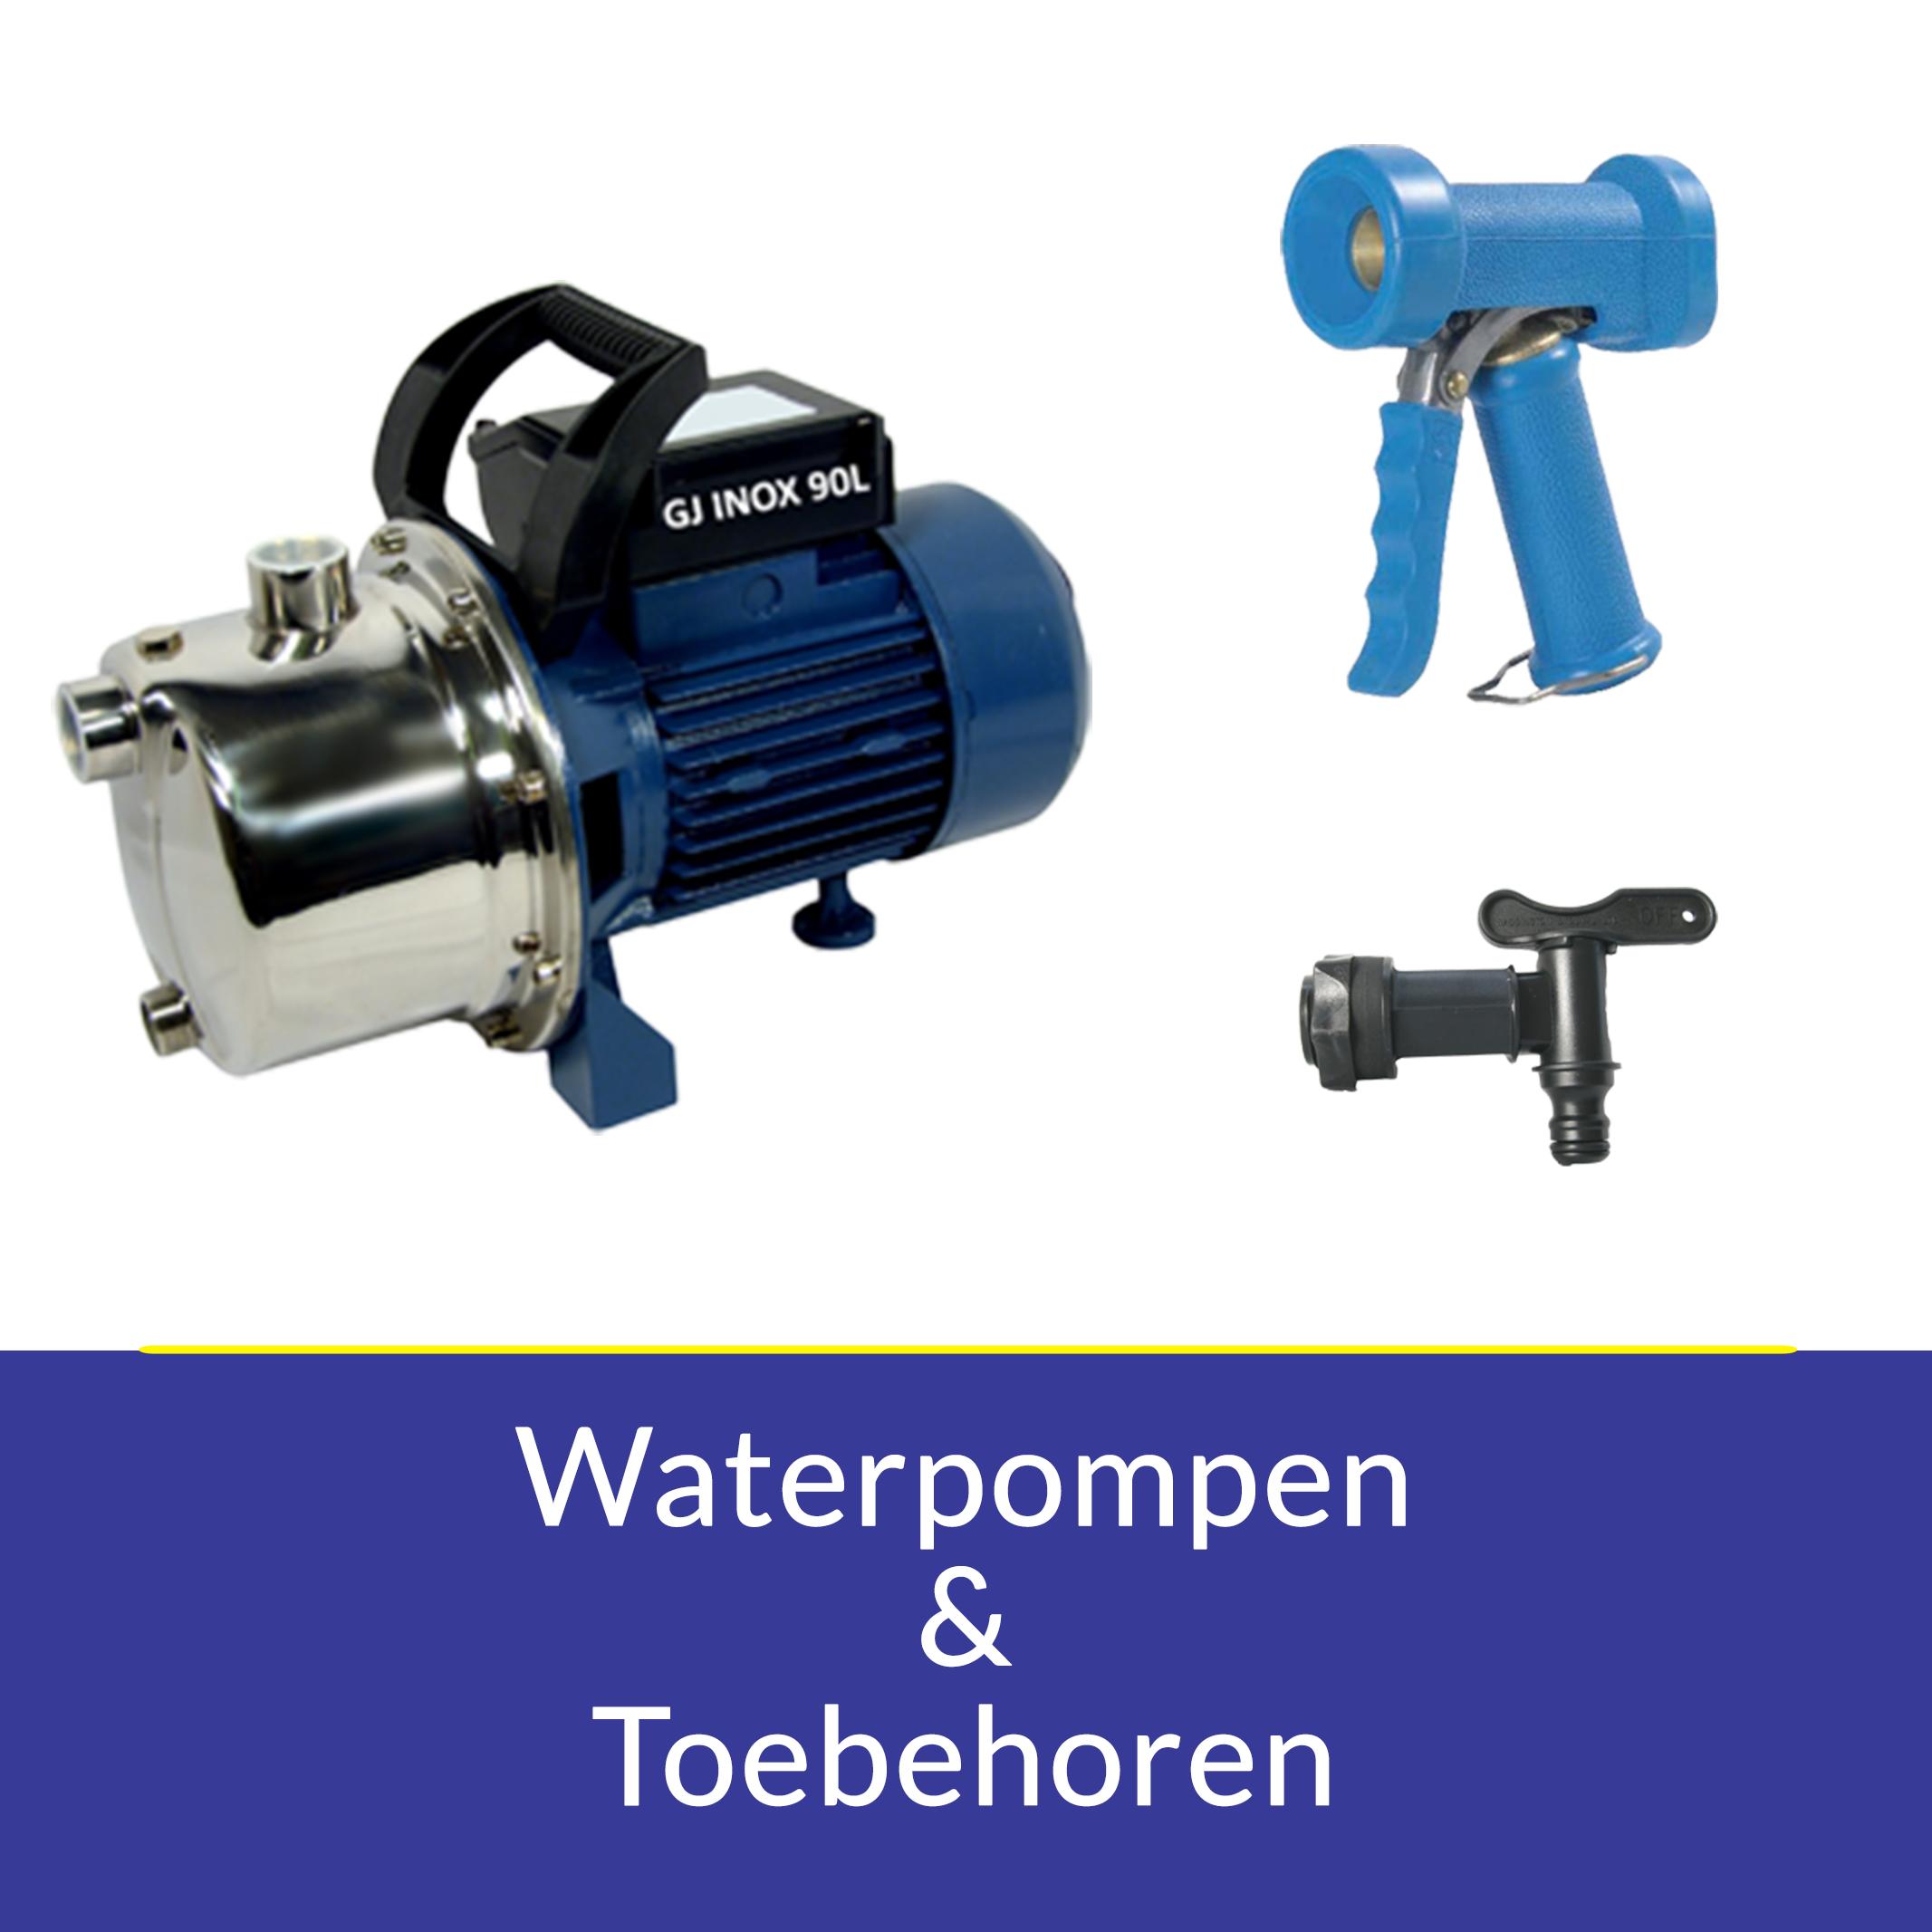 WaterpompenEnToebehoren